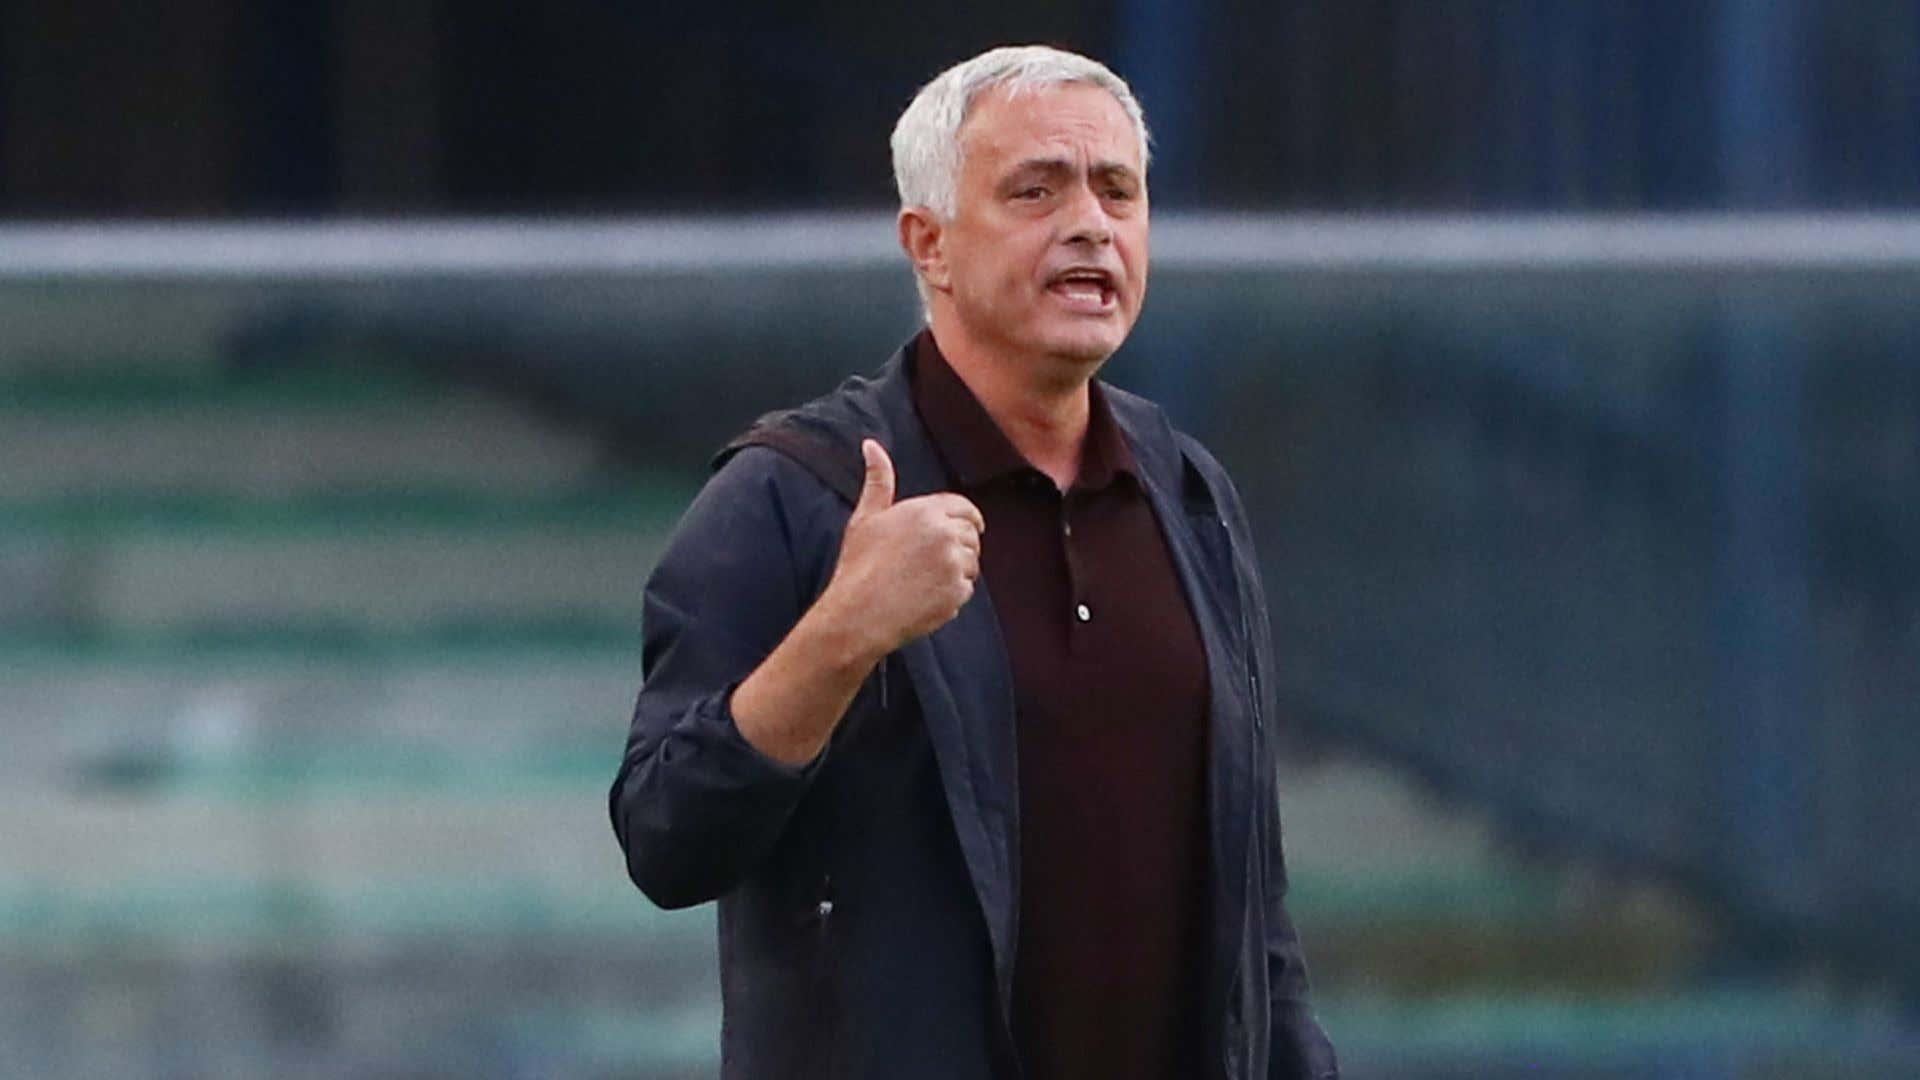 Mourinho admits 'emotional connection' to Newcastle amid job links